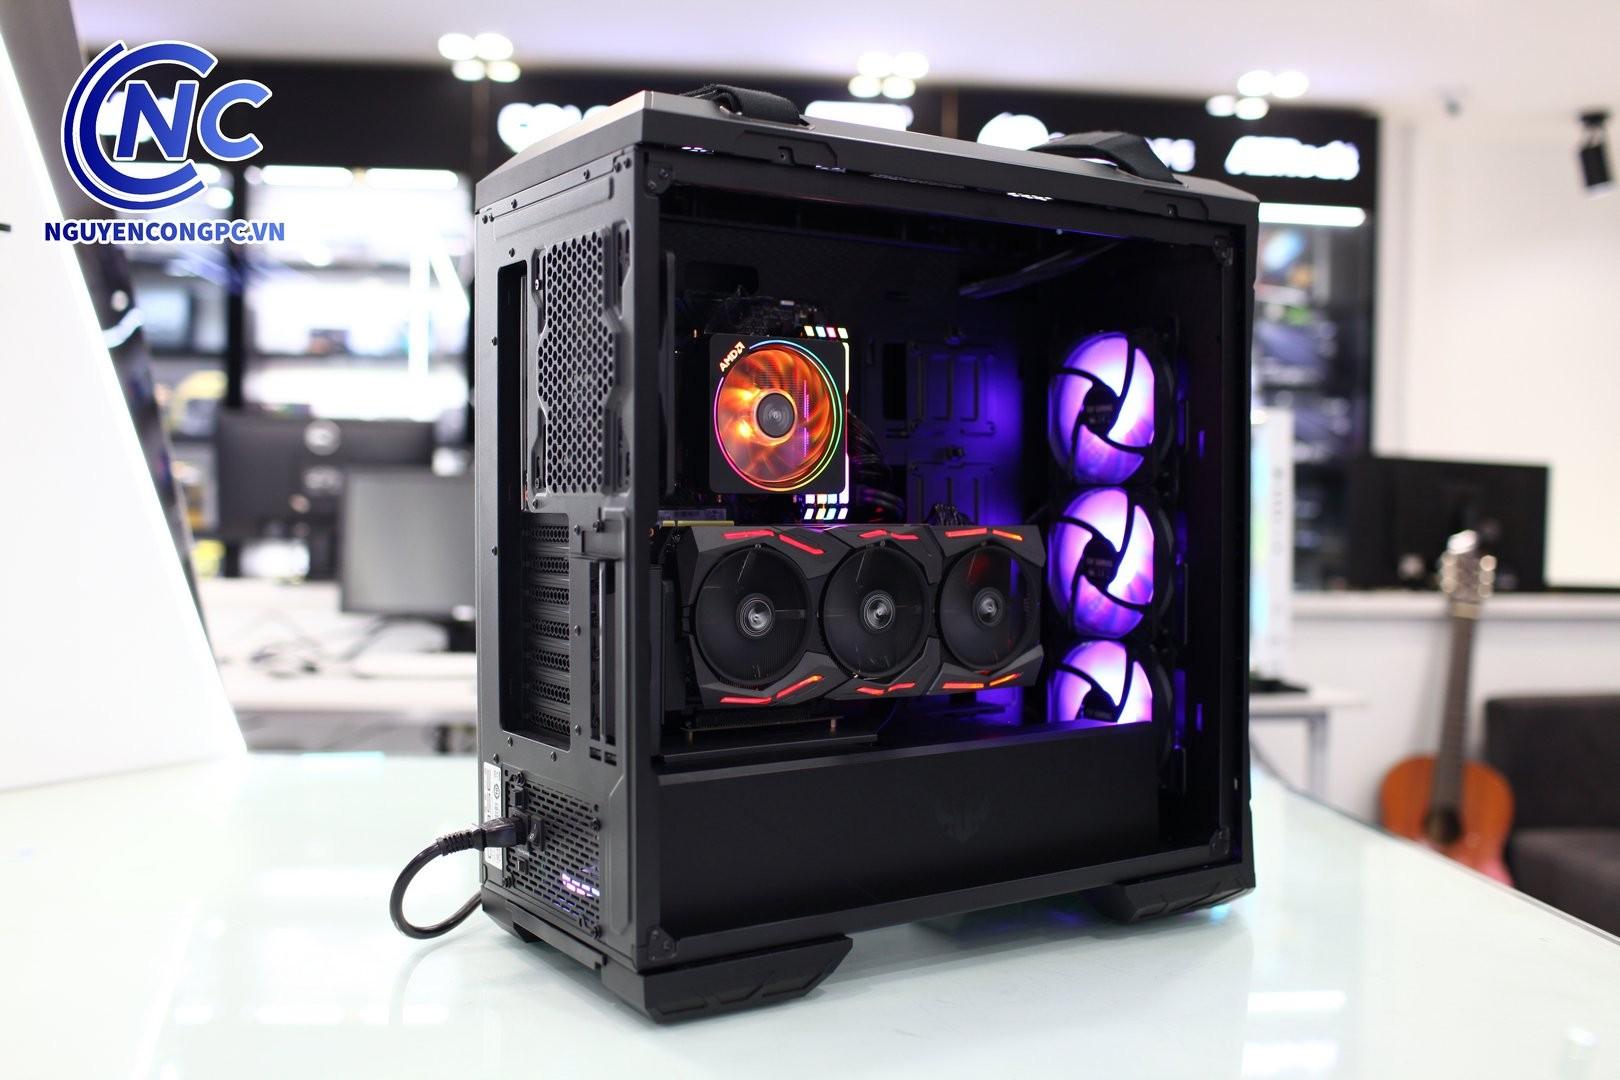 PC AMD RYZEN 7 3700X / RAM 32GB / RTX 2080 TI 11G